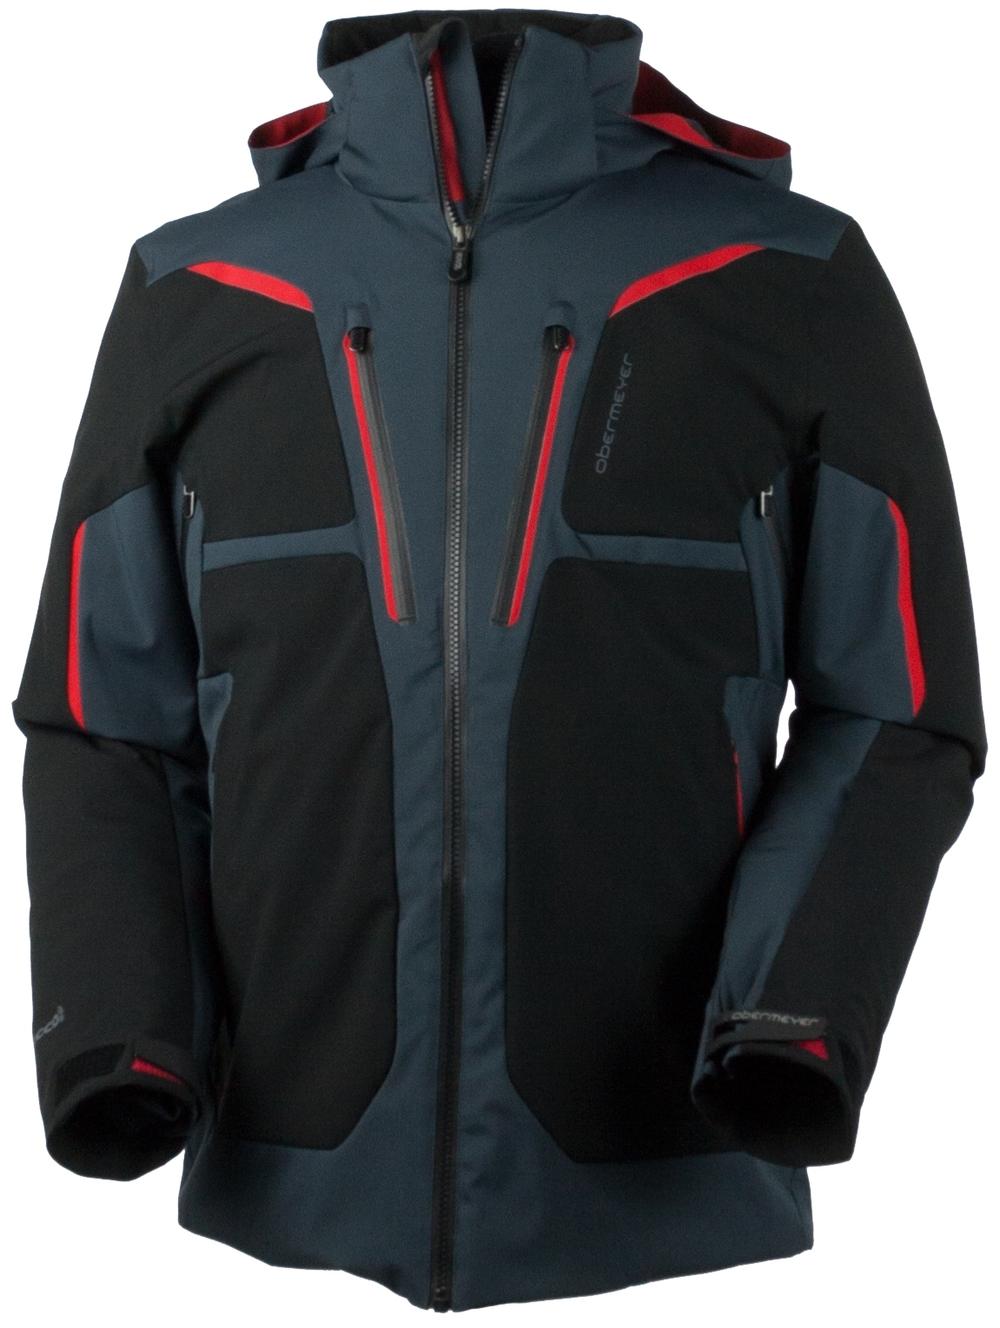 Obermeyer Spartan Jacket, $430